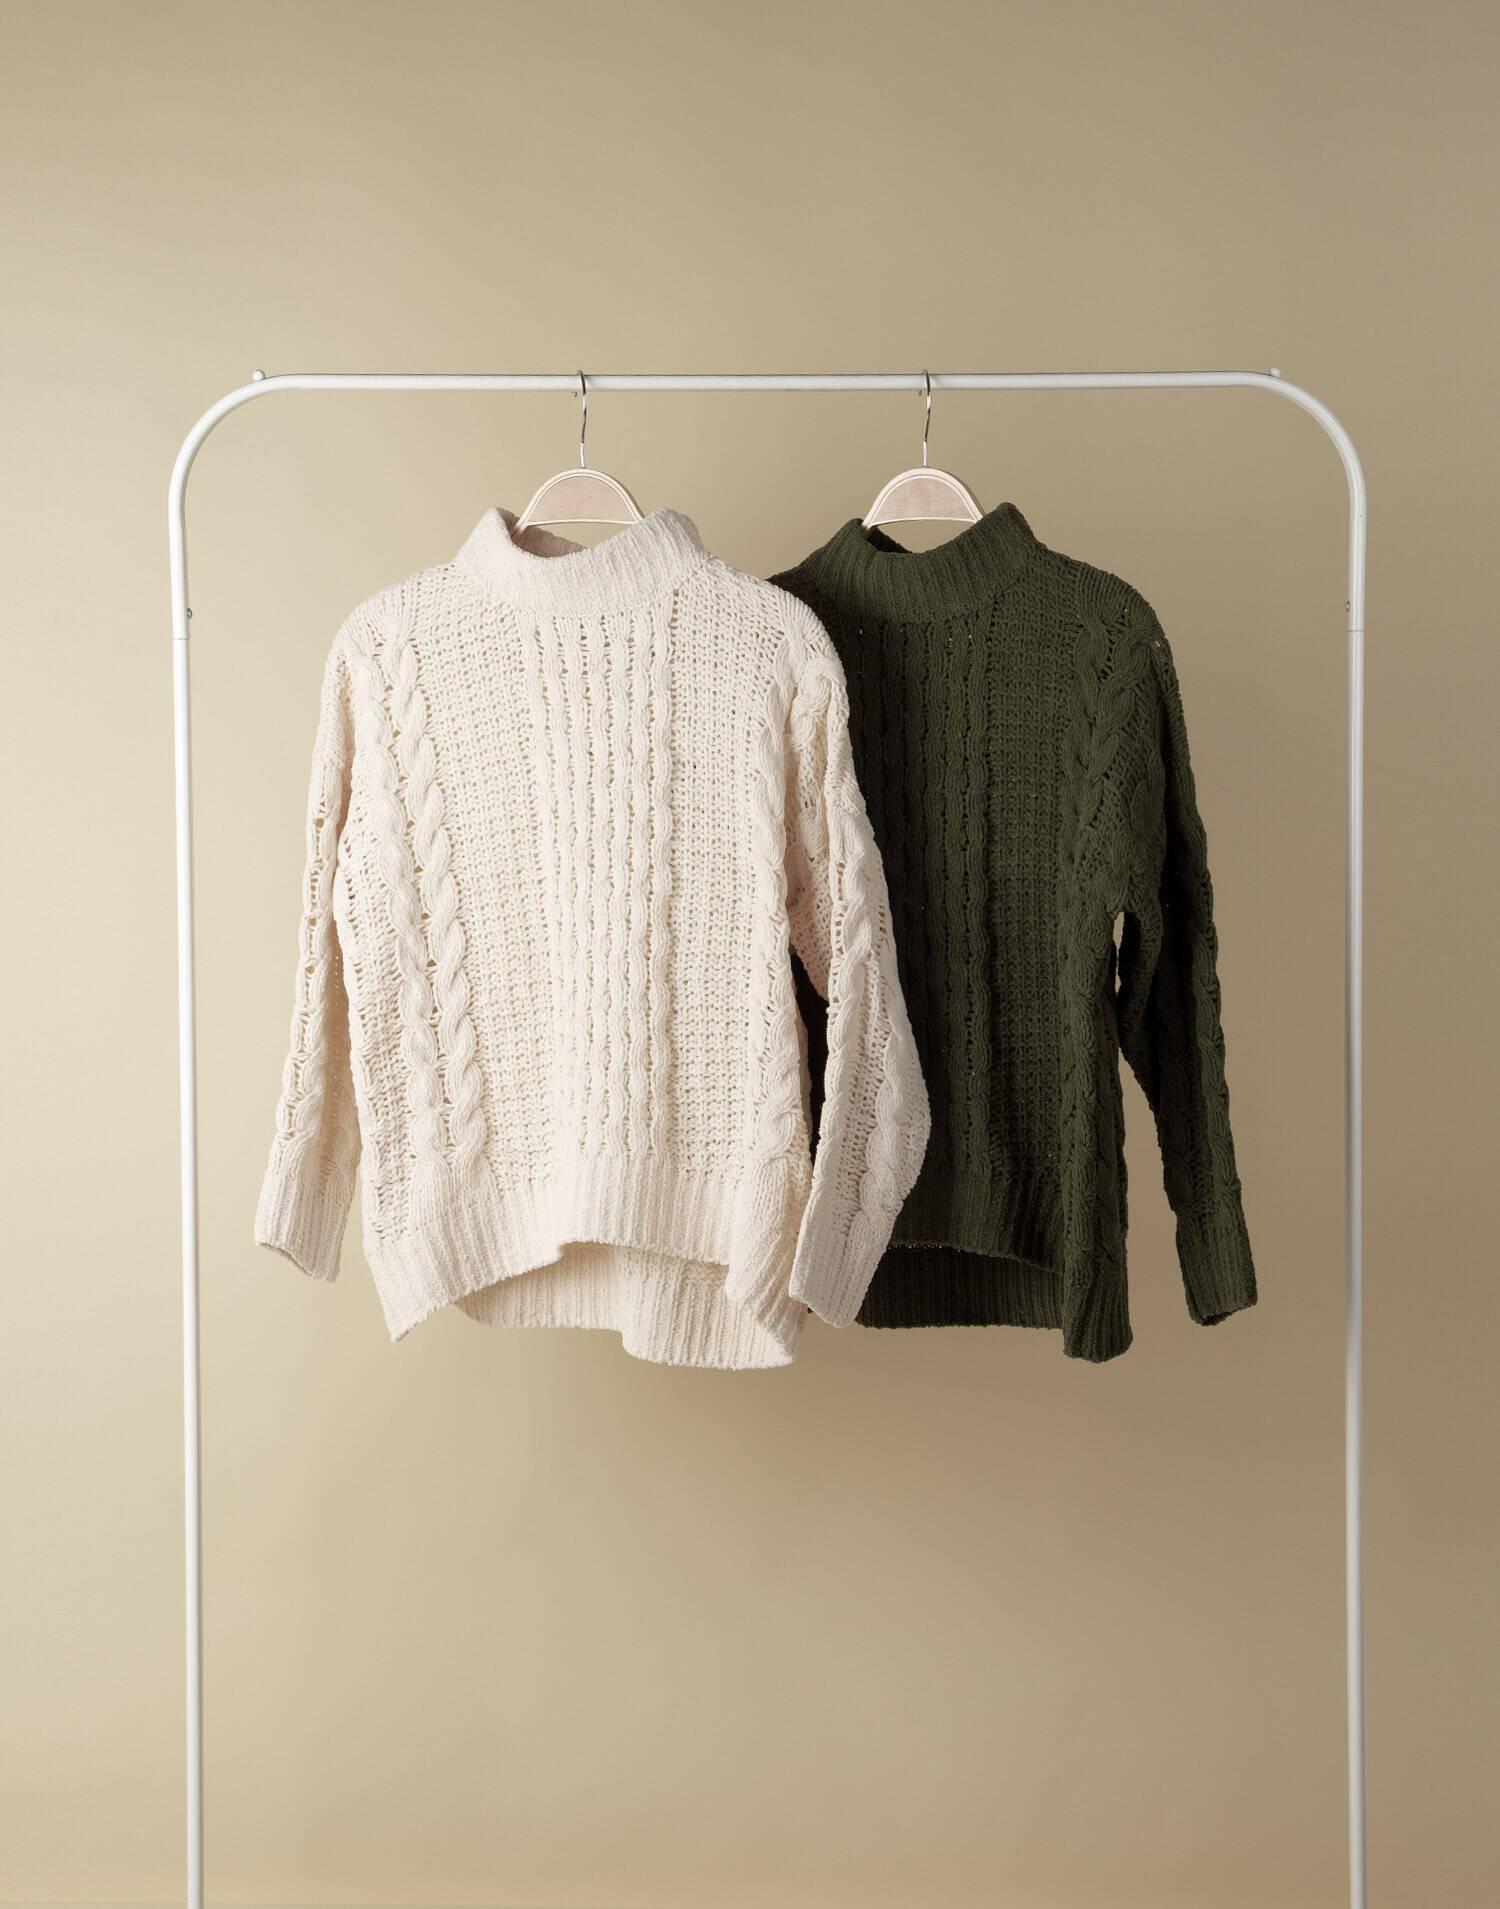 Braided chenille sweater